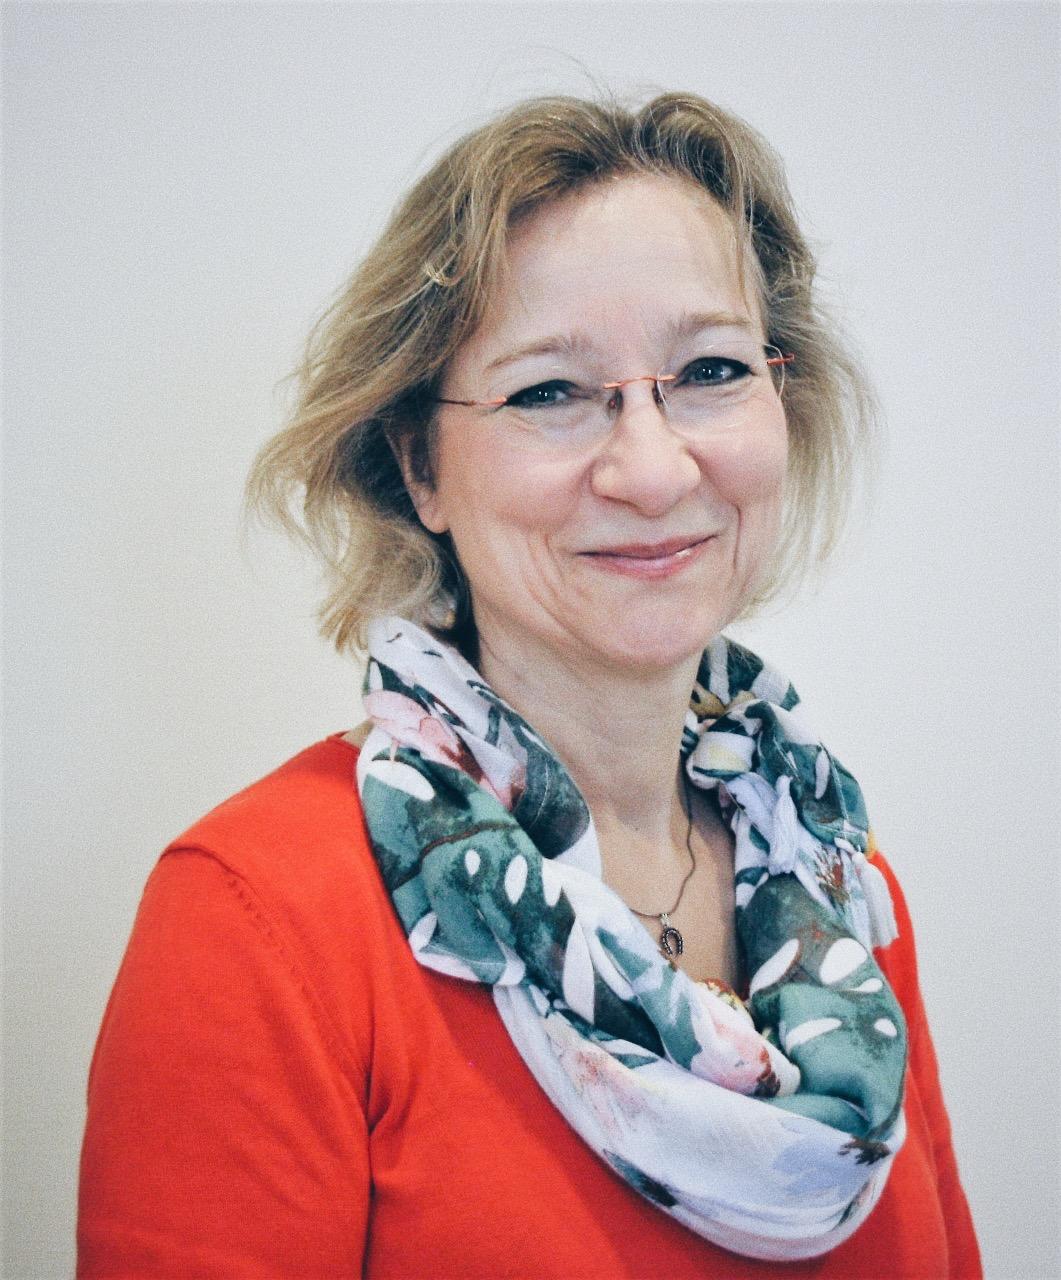 Klaudia Müller